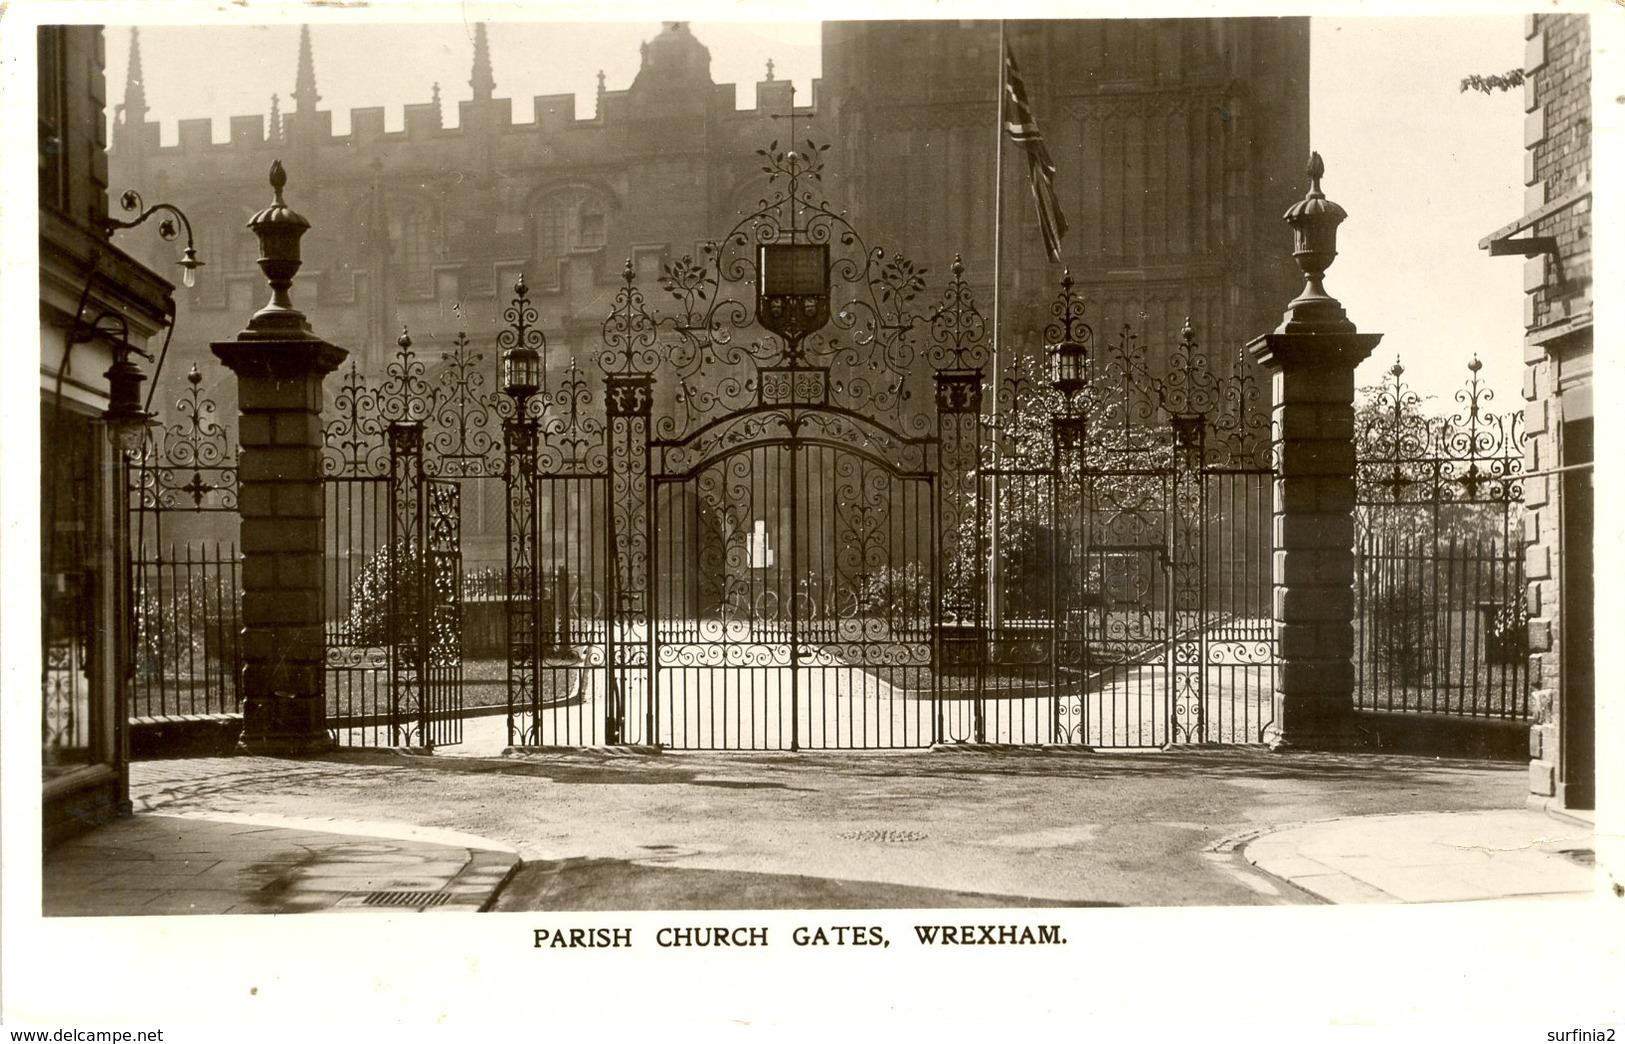 CLWYD - WREXHAM - PARISH CHURCH GATES RP Clw376a - Flintshire